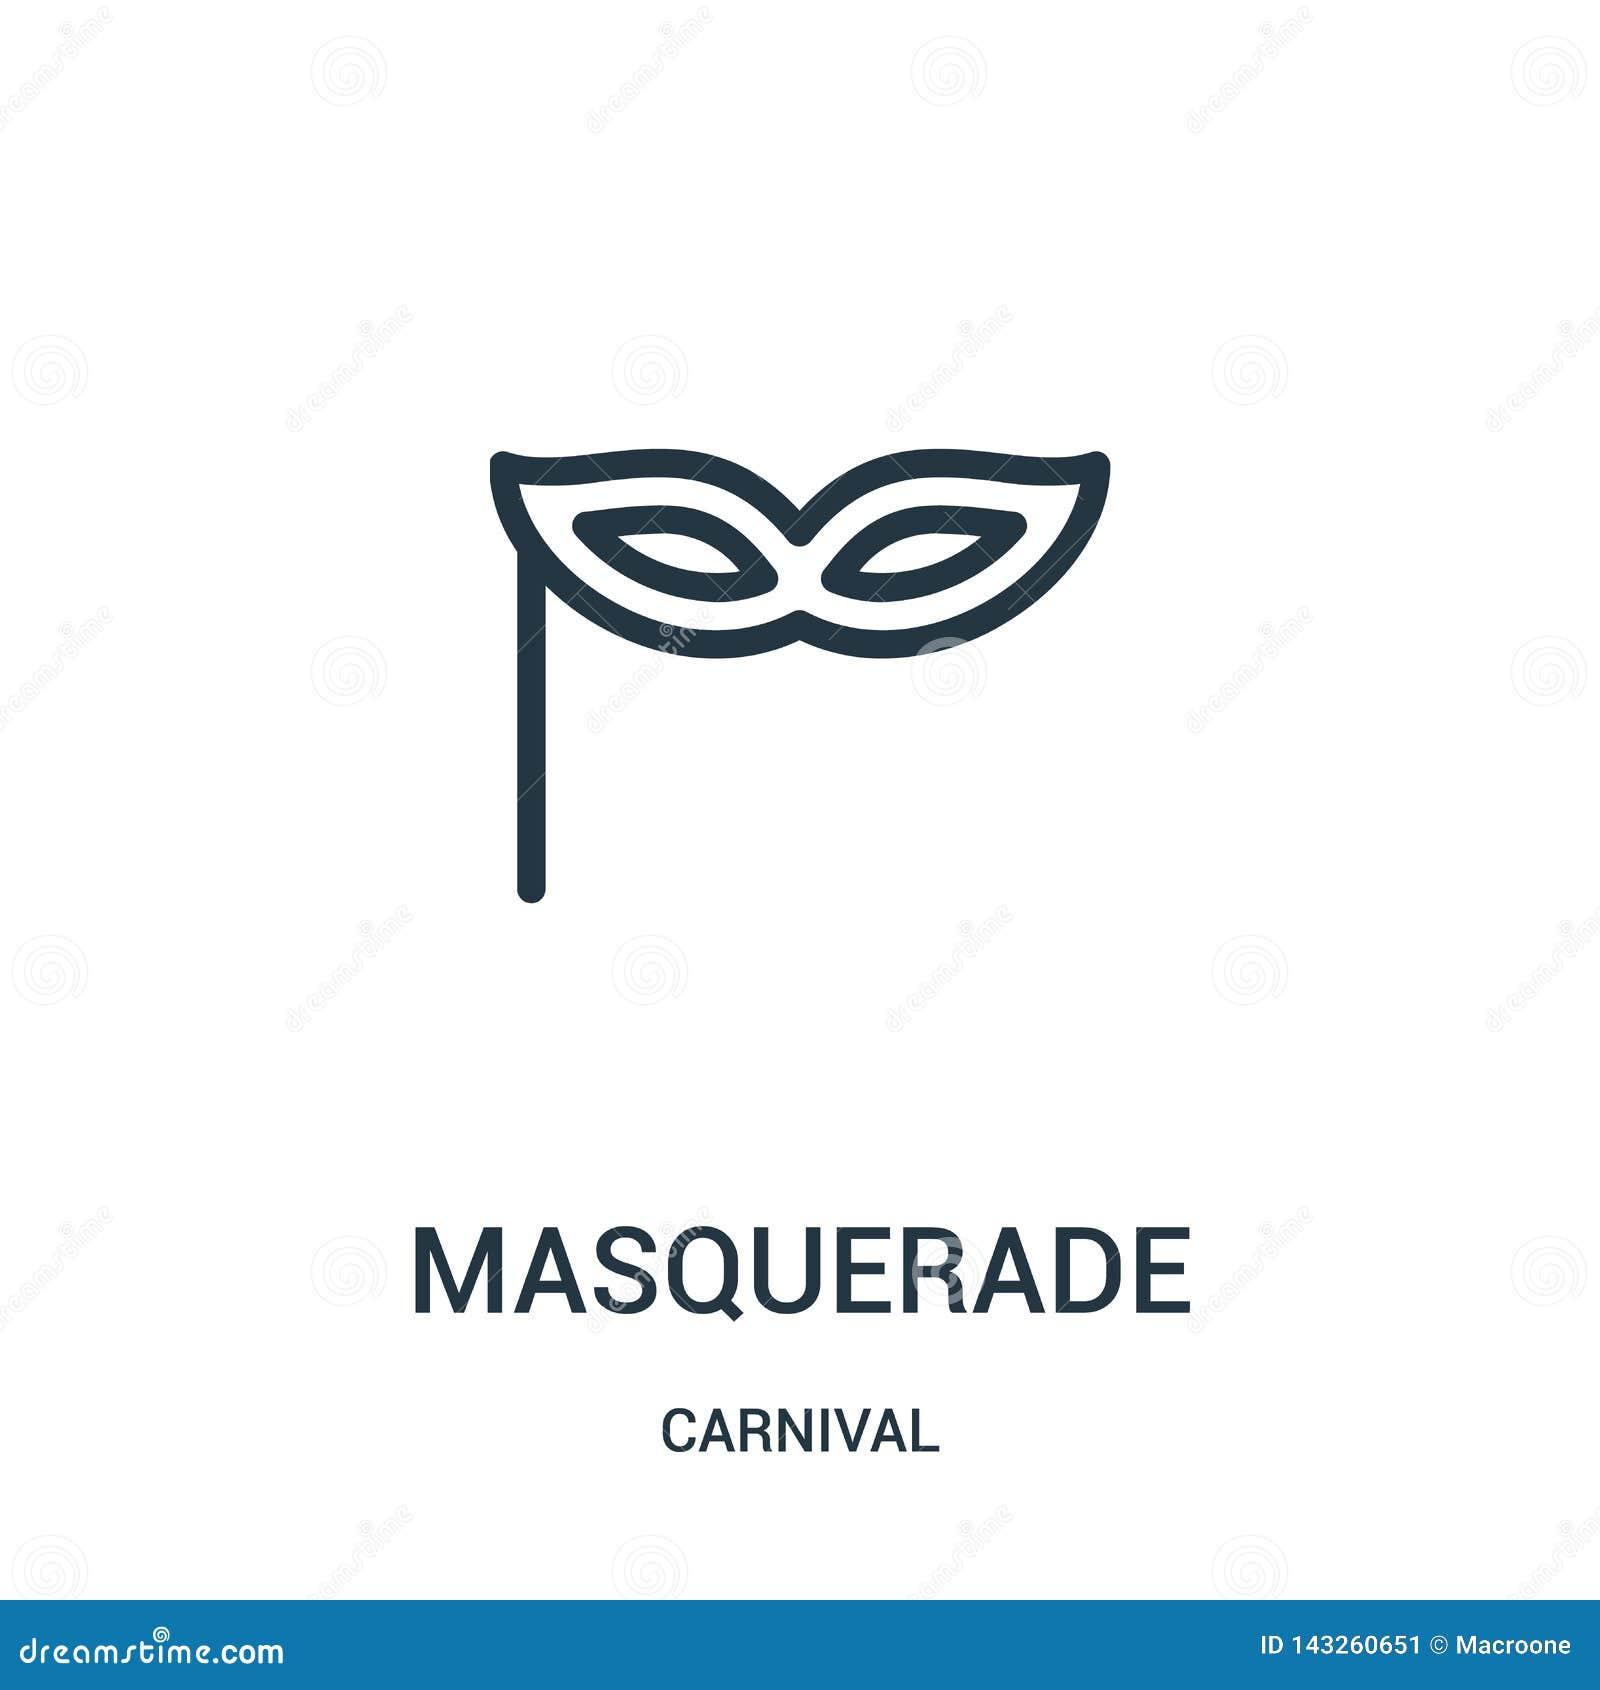 masquerade icon vector from carnival collection. Thin line masquerade outline icon vector illustration